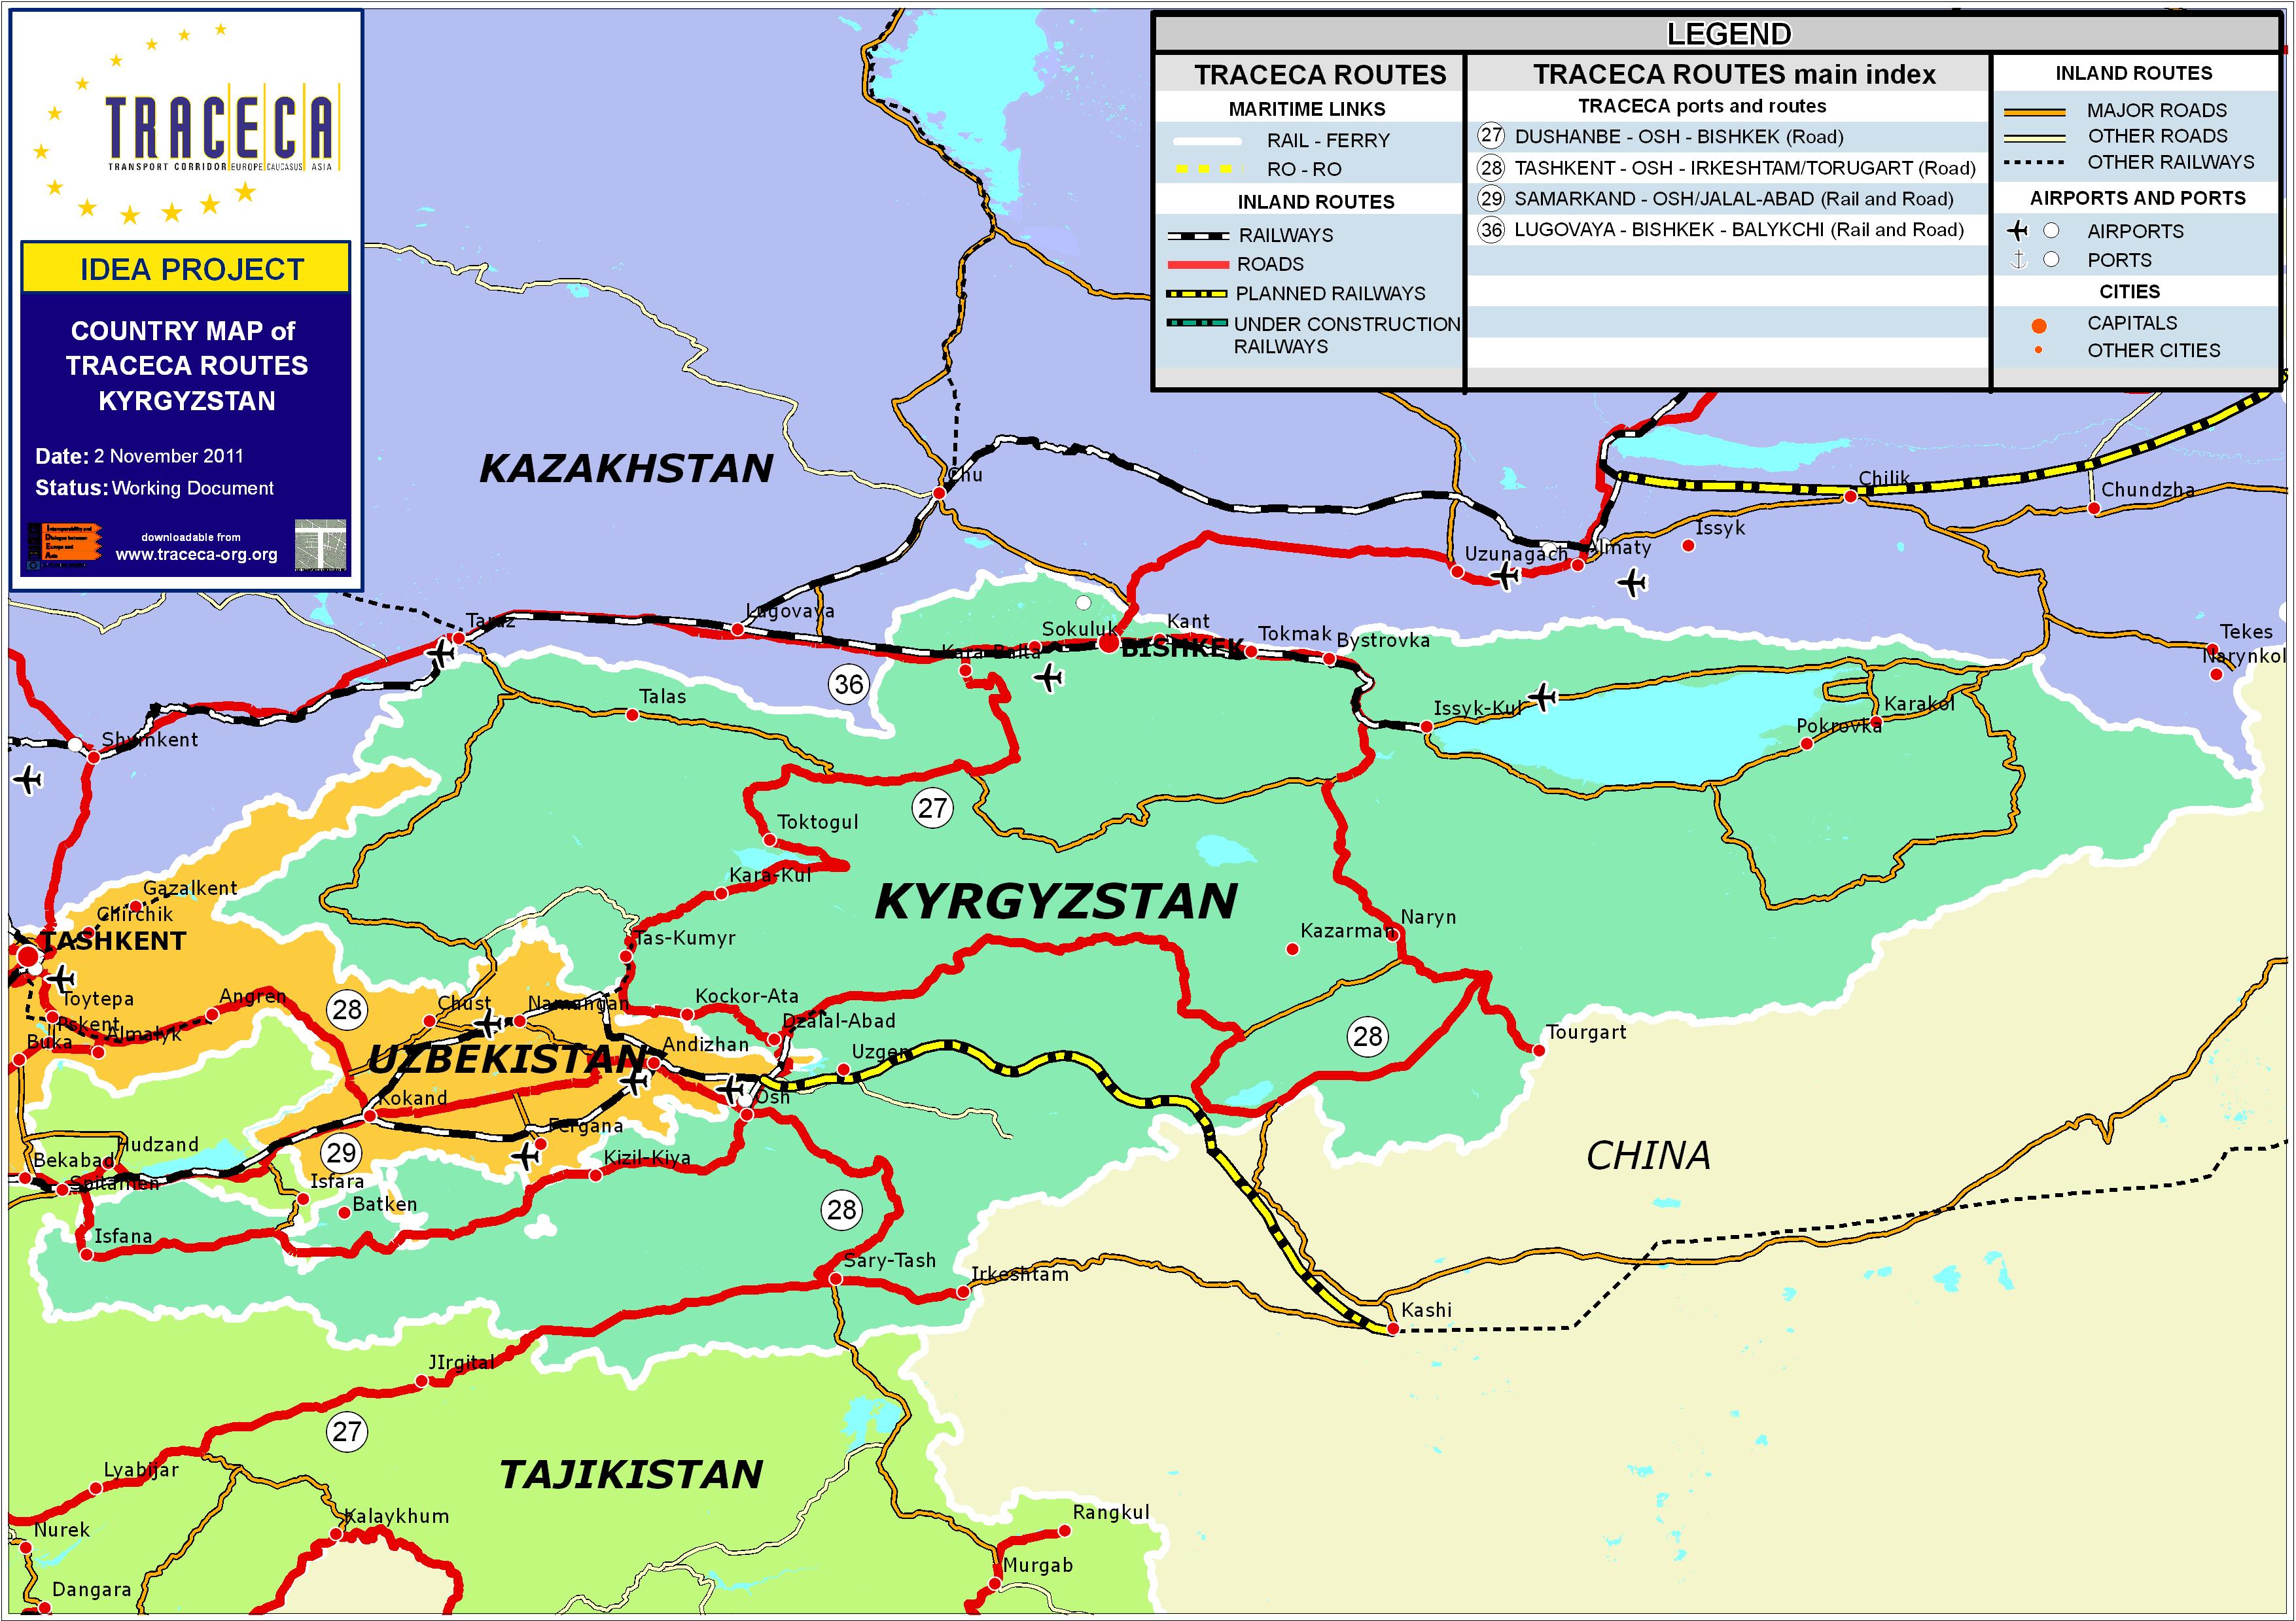 kirgisistan kart Railway Kirgisistan   kart, nettside, bilder kirgisistan kart